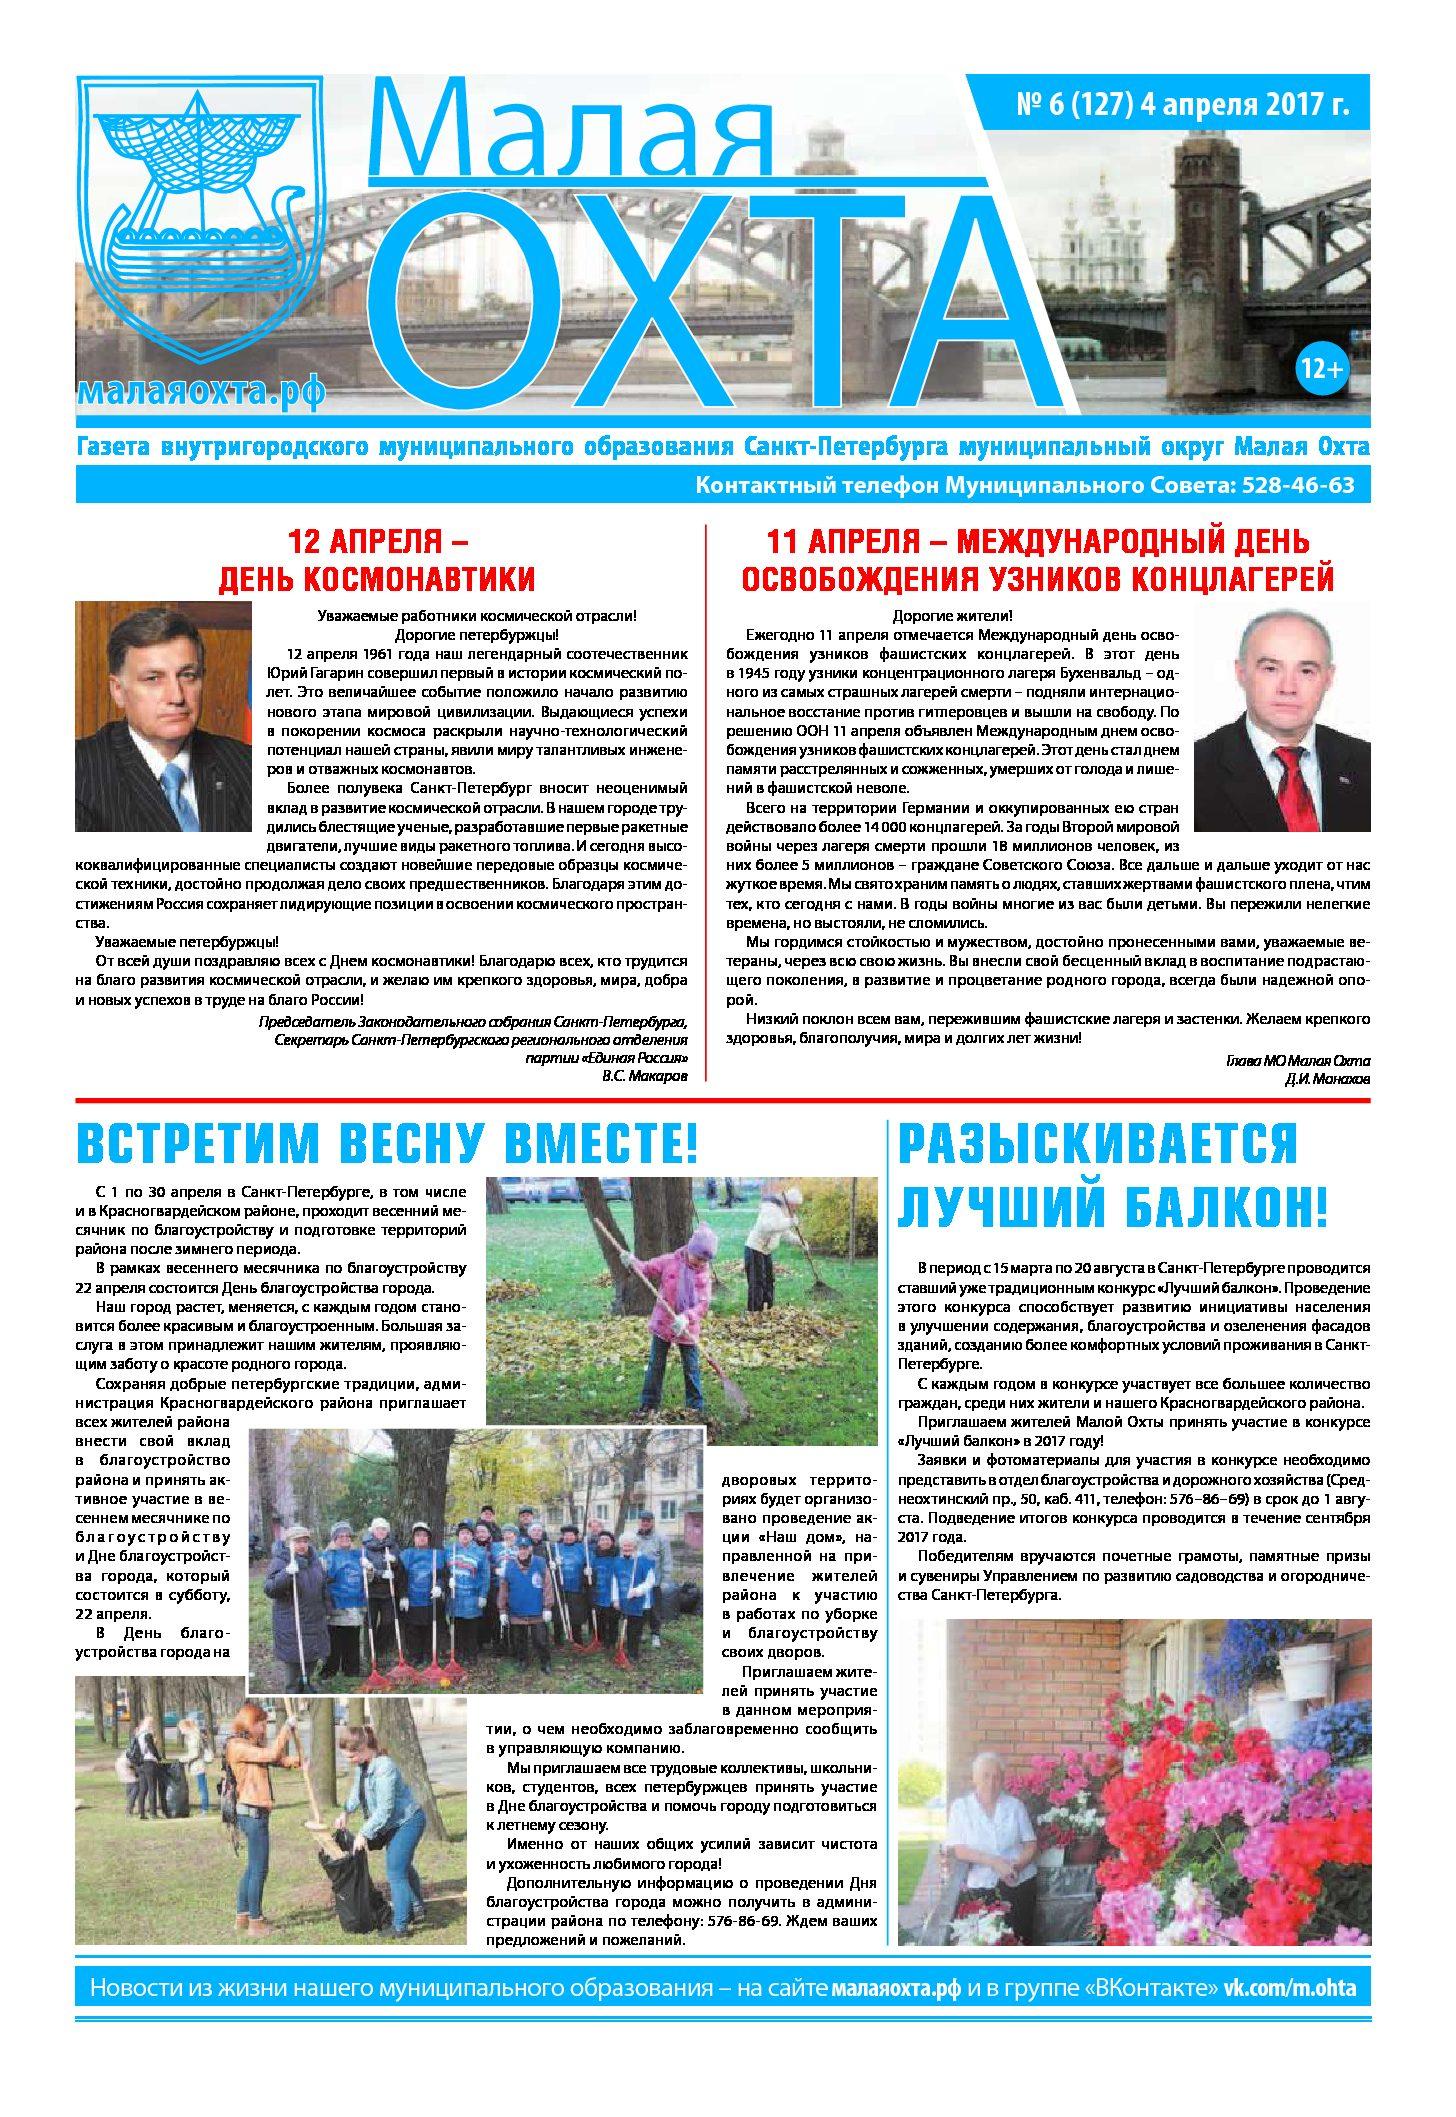 Газета № 06 2017